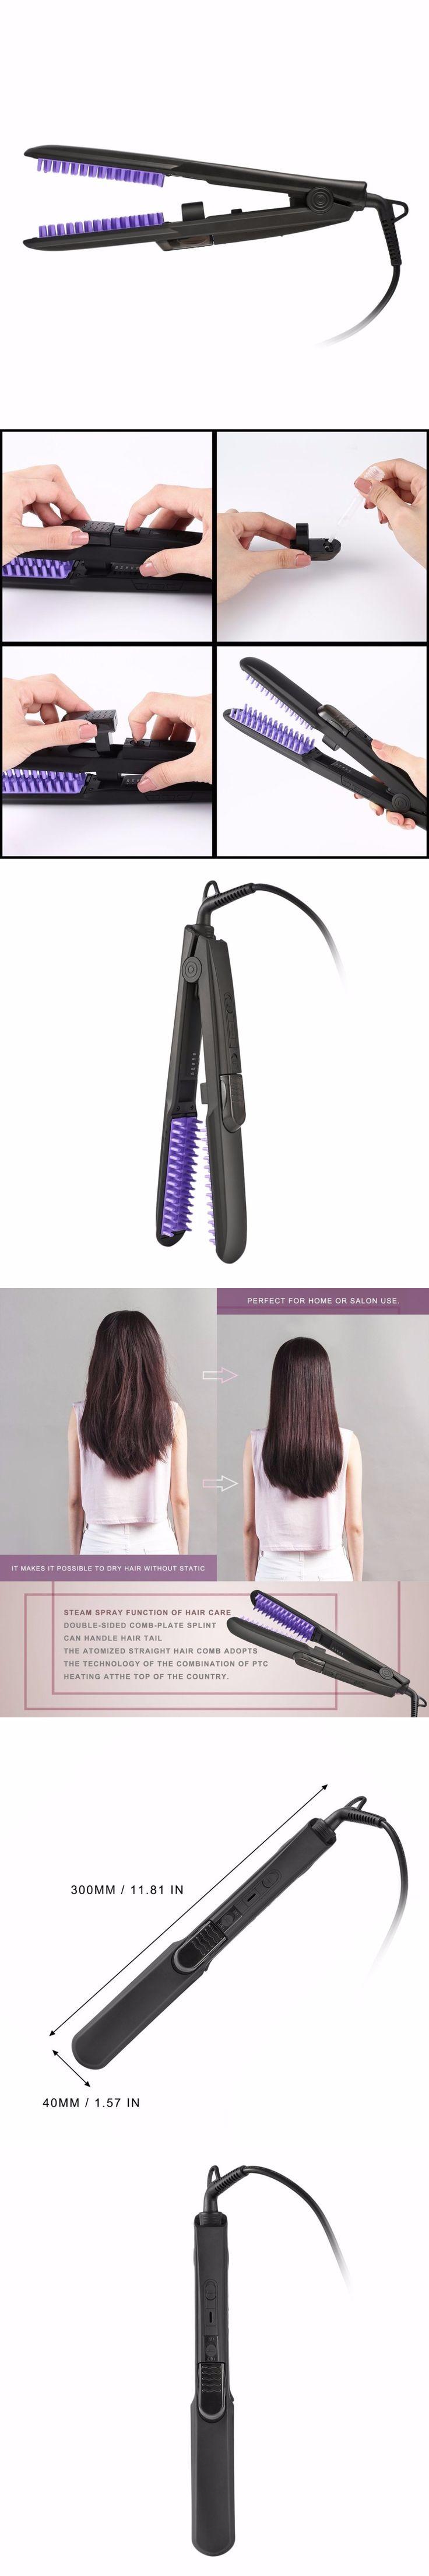 Professional Spray Steam Hair Straightener Brush Ceramic Flat Iron Hair Straightening Brush Comb for Home Salon Travel EU Plug